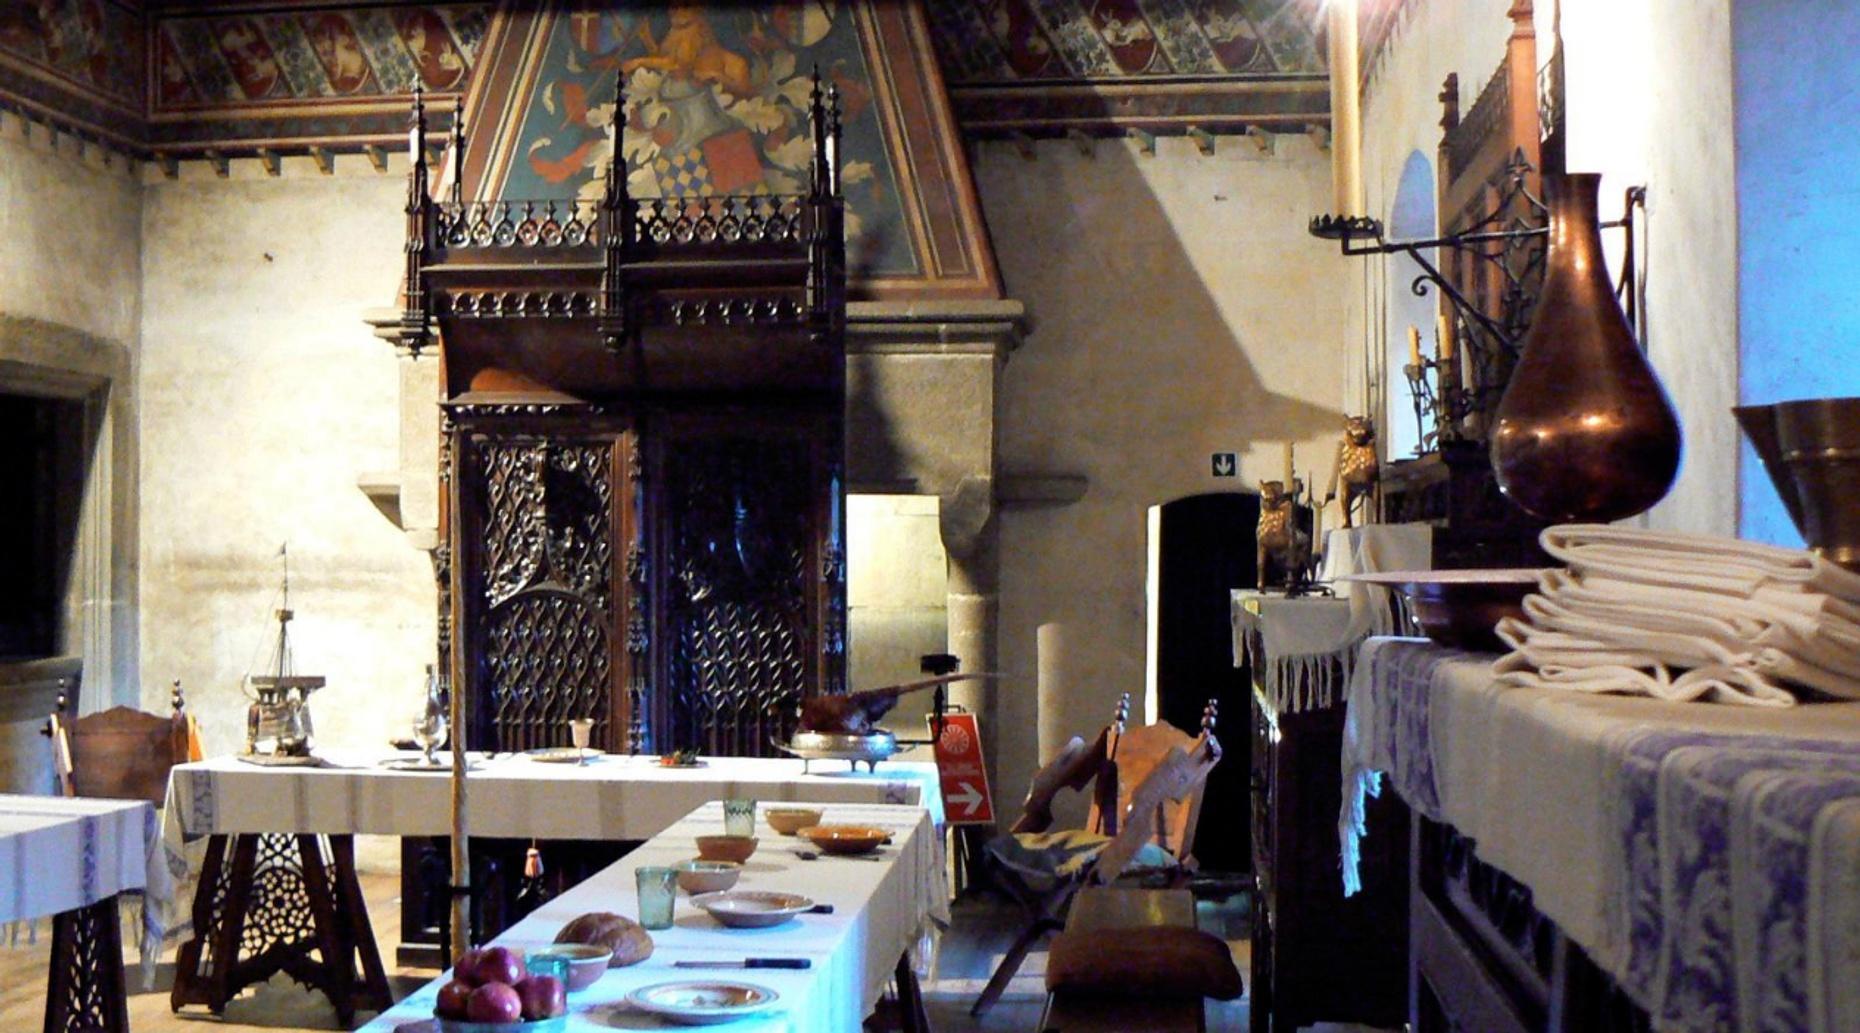 One-Hour Haunted Room Escape Adventure in Savannah